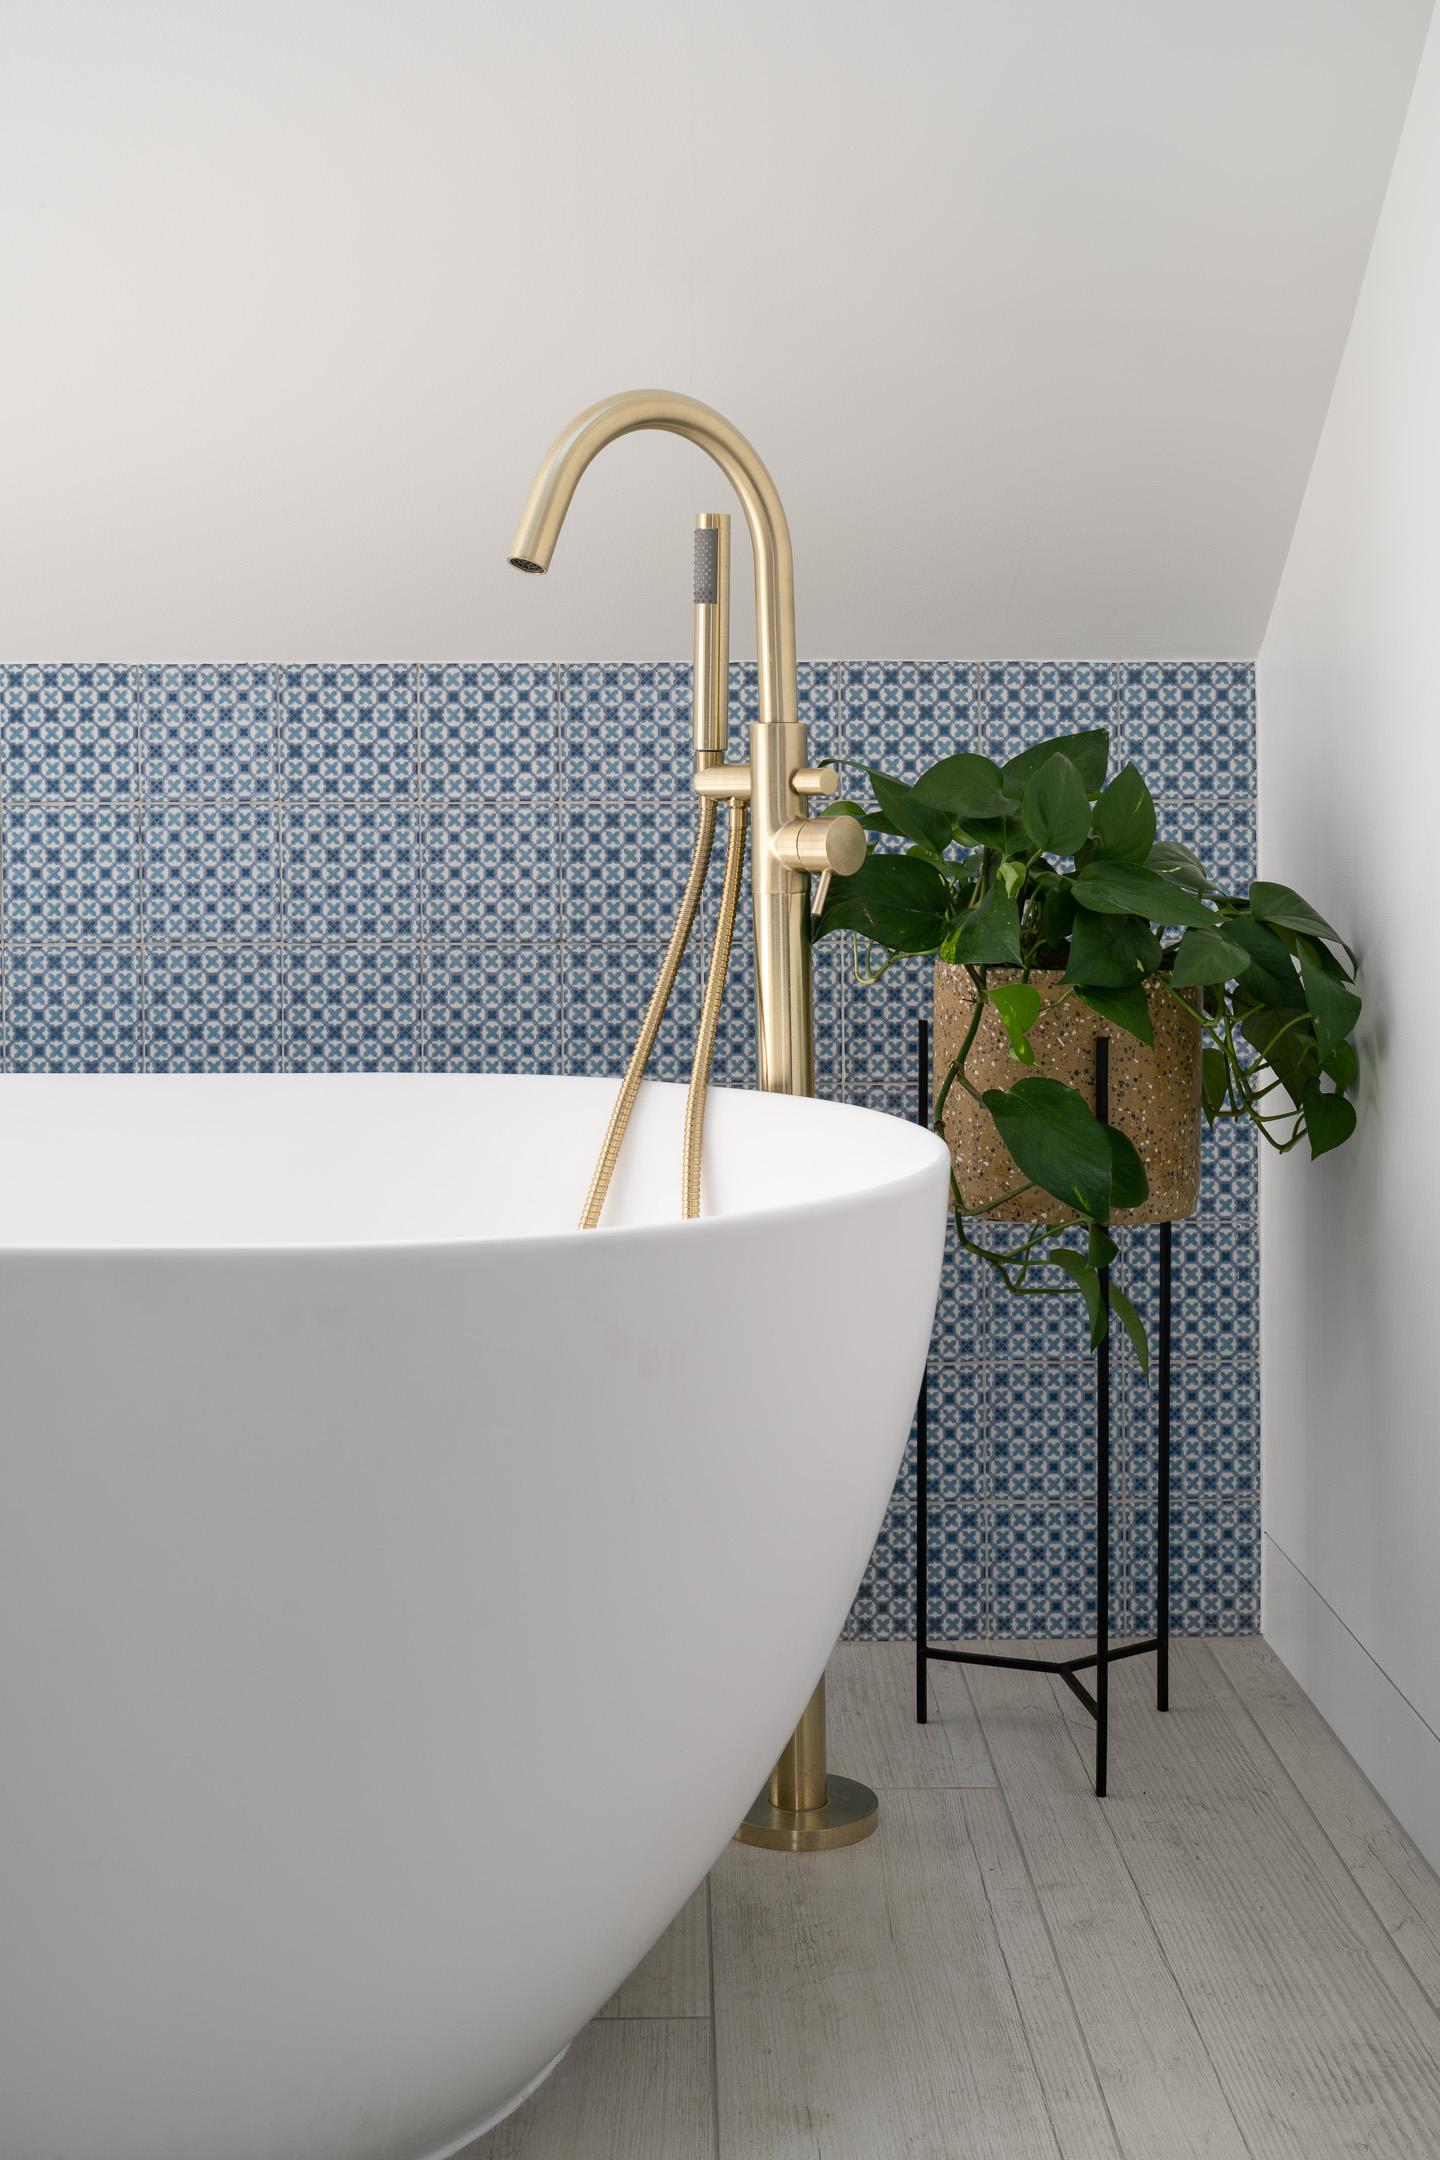 Web - Life Design - Ally Pally -Bathroom mid to bath and tap 1_.jpg